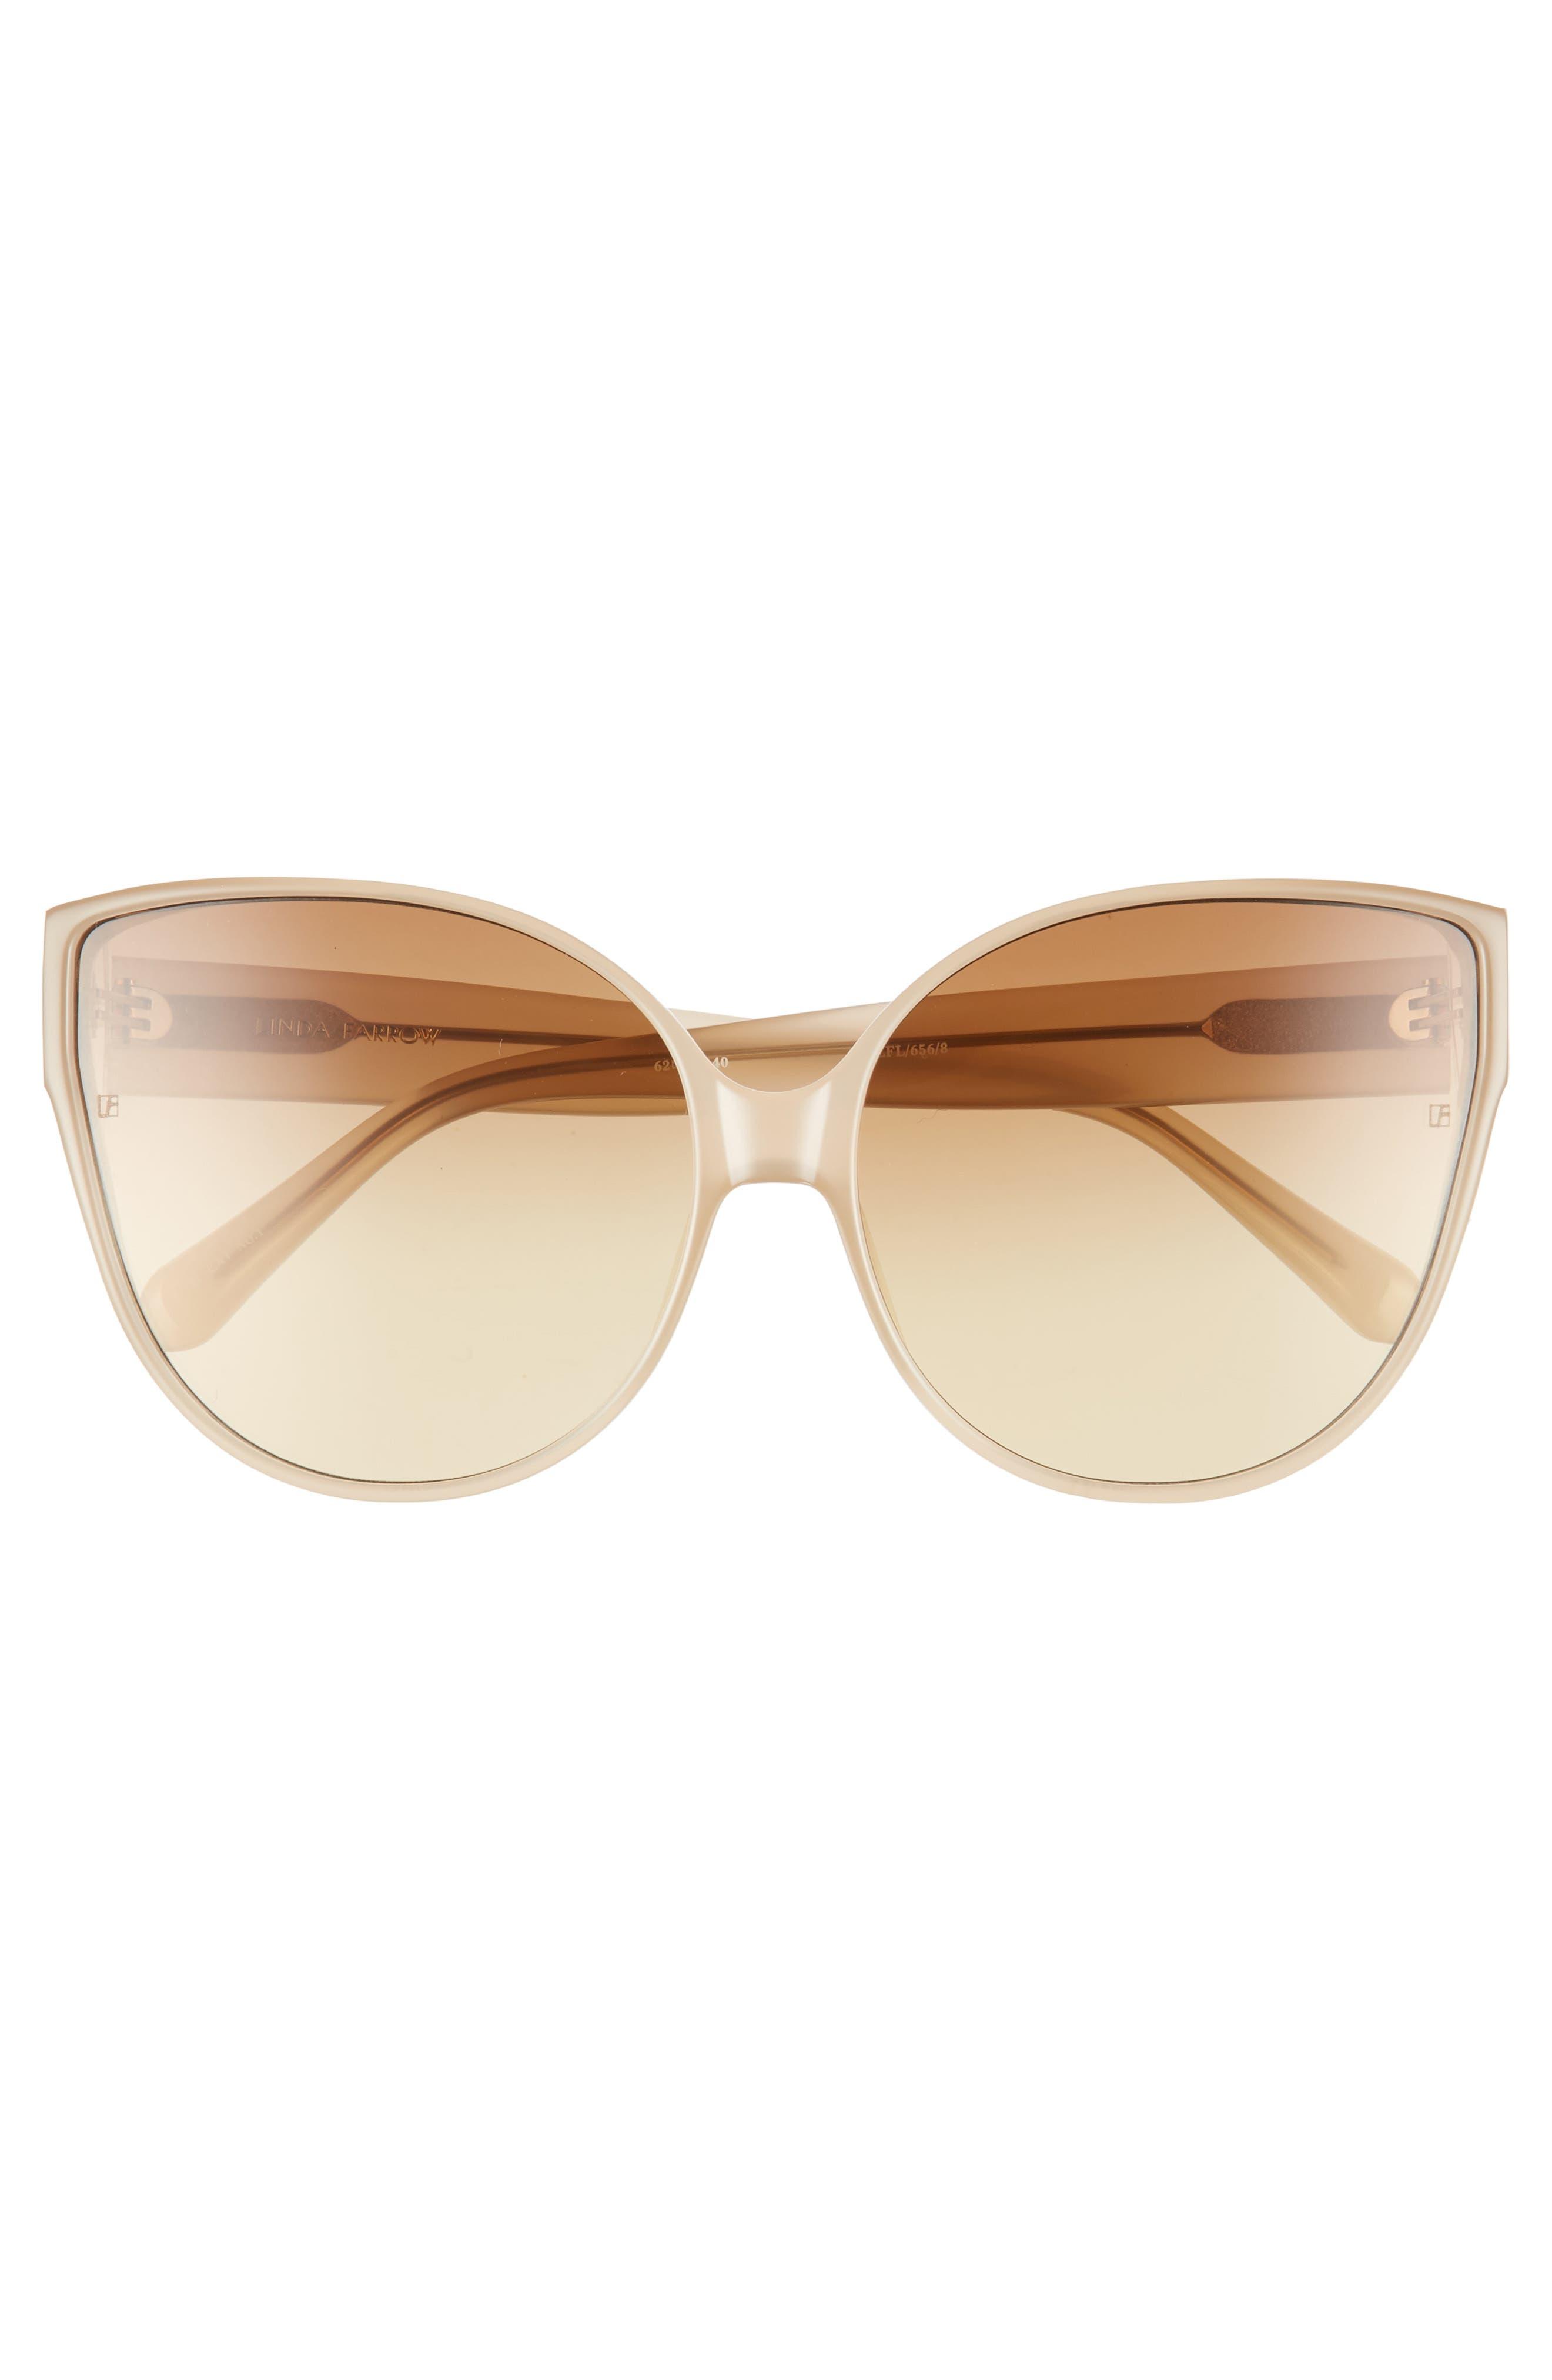 62mm Oversize Cat Eye Sunglasses,                             Alternate thumbnail 3, color,                             MILKY TOBACCO